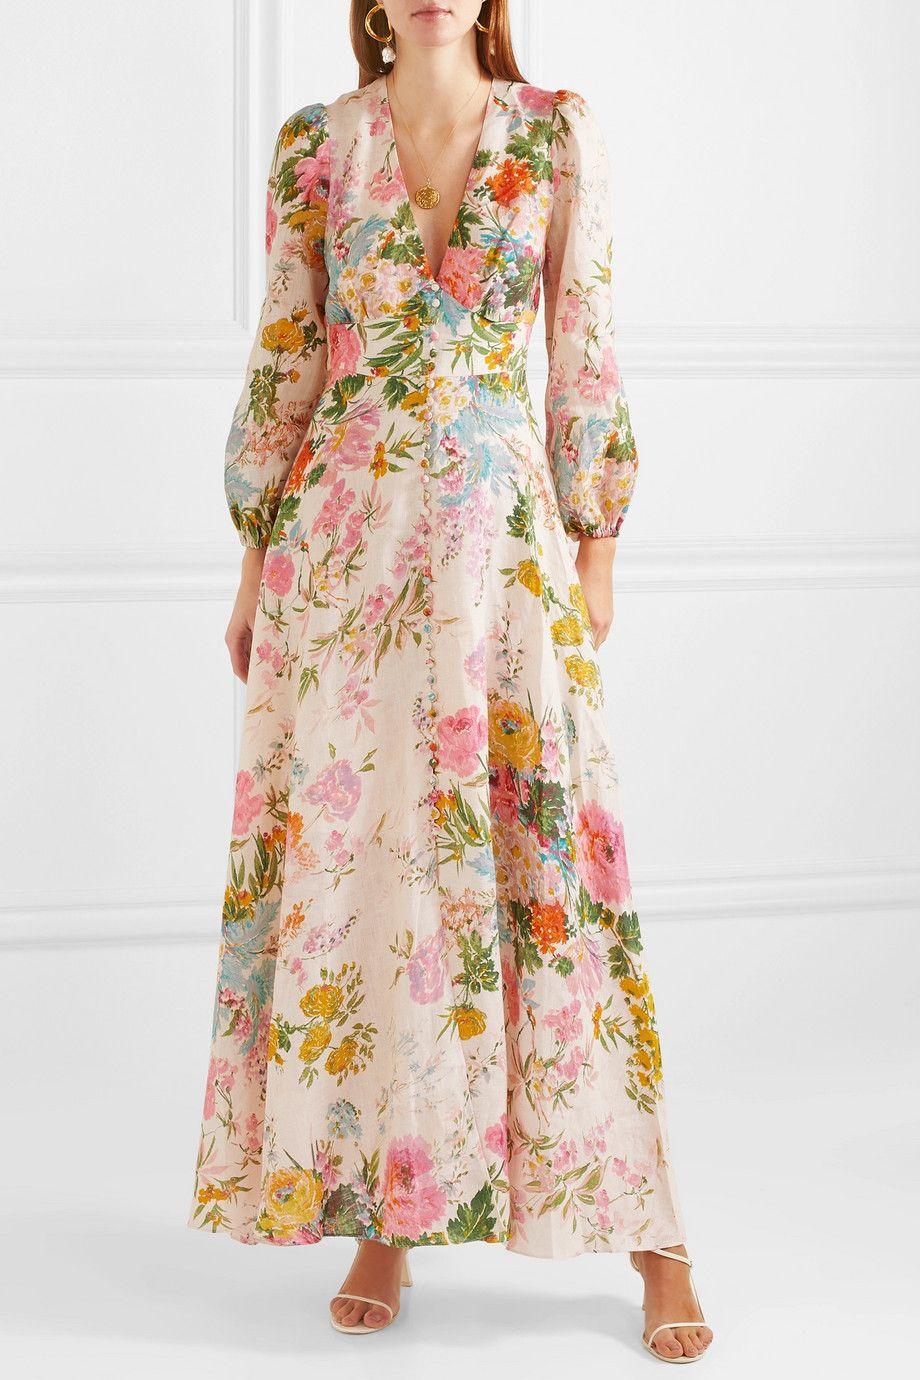 125a52f5b4a75 Zimmermann - Heathers floral-print linen maxi dress in 2019 | Modles ...